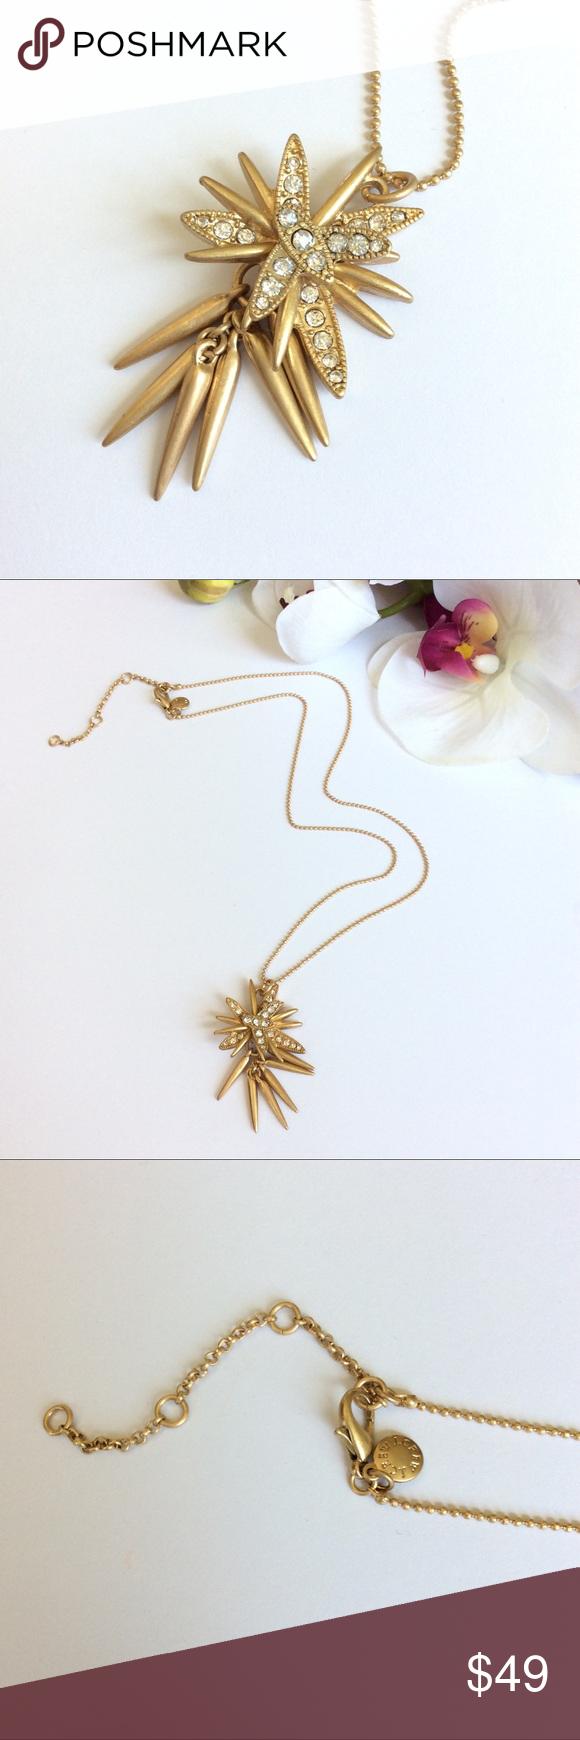 Salej crew starbursts gold pendant necklace boutique gold